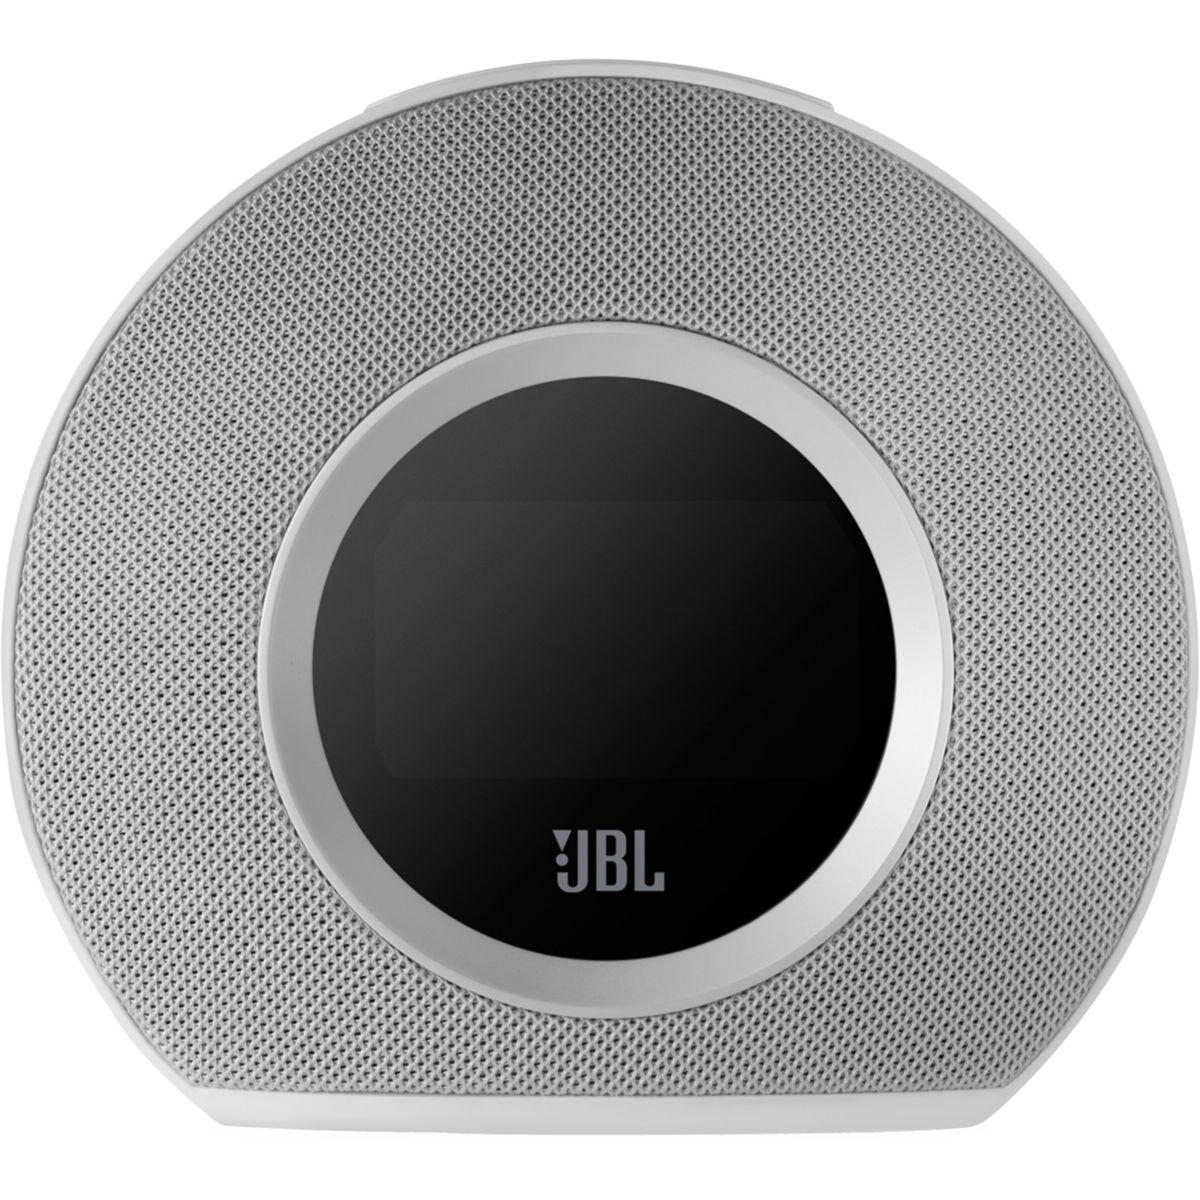 Radio-réveil bluetooth jbl horizon blanc - livraison offerte : code livpremium (photo)